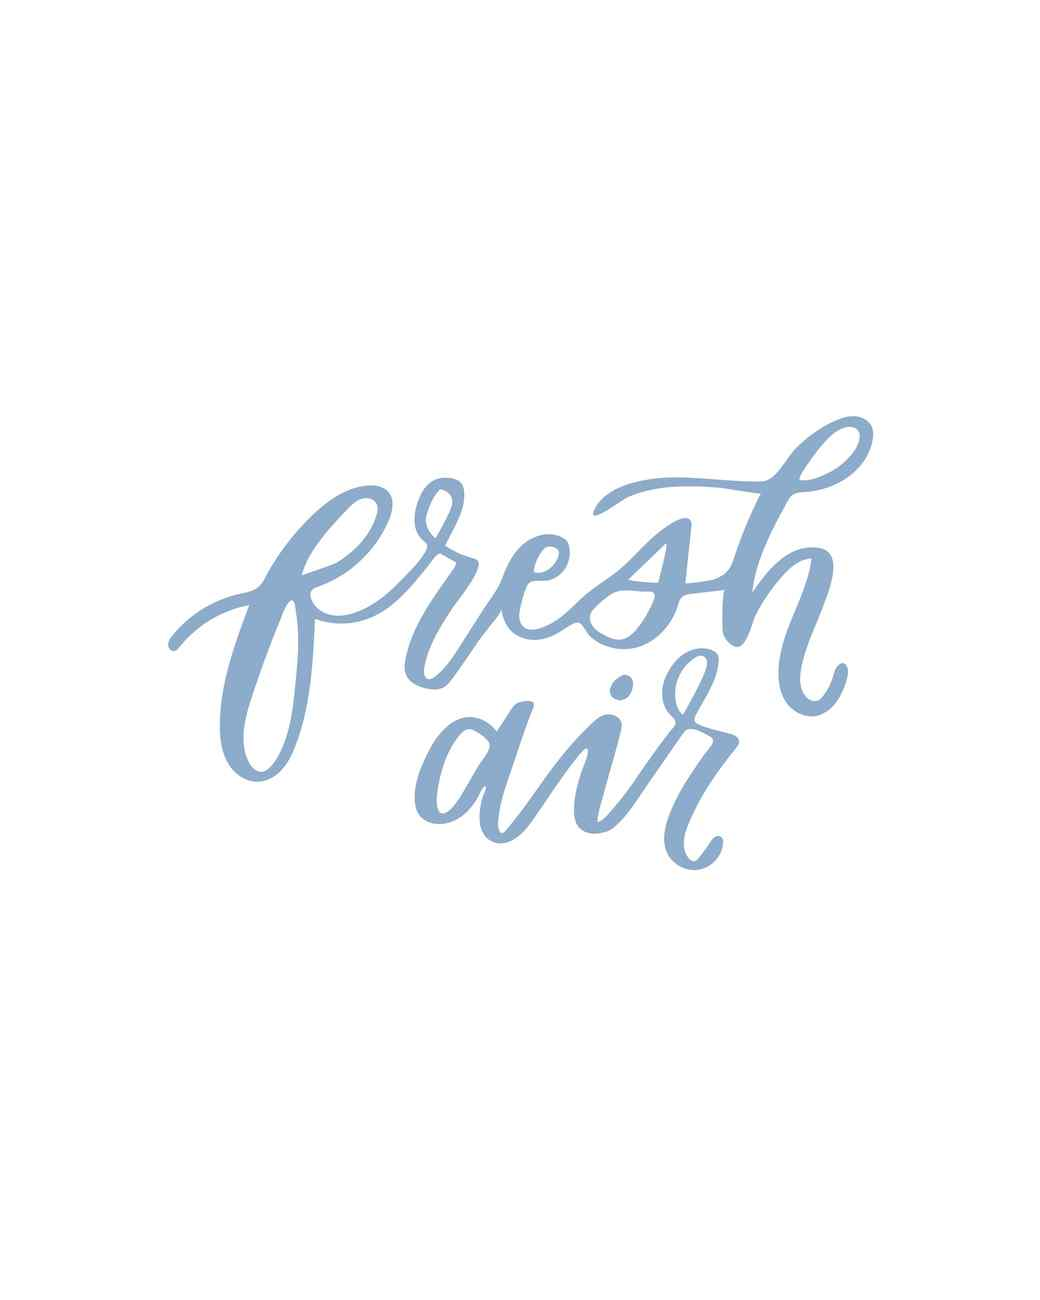 """fresh air"" calligraphy"